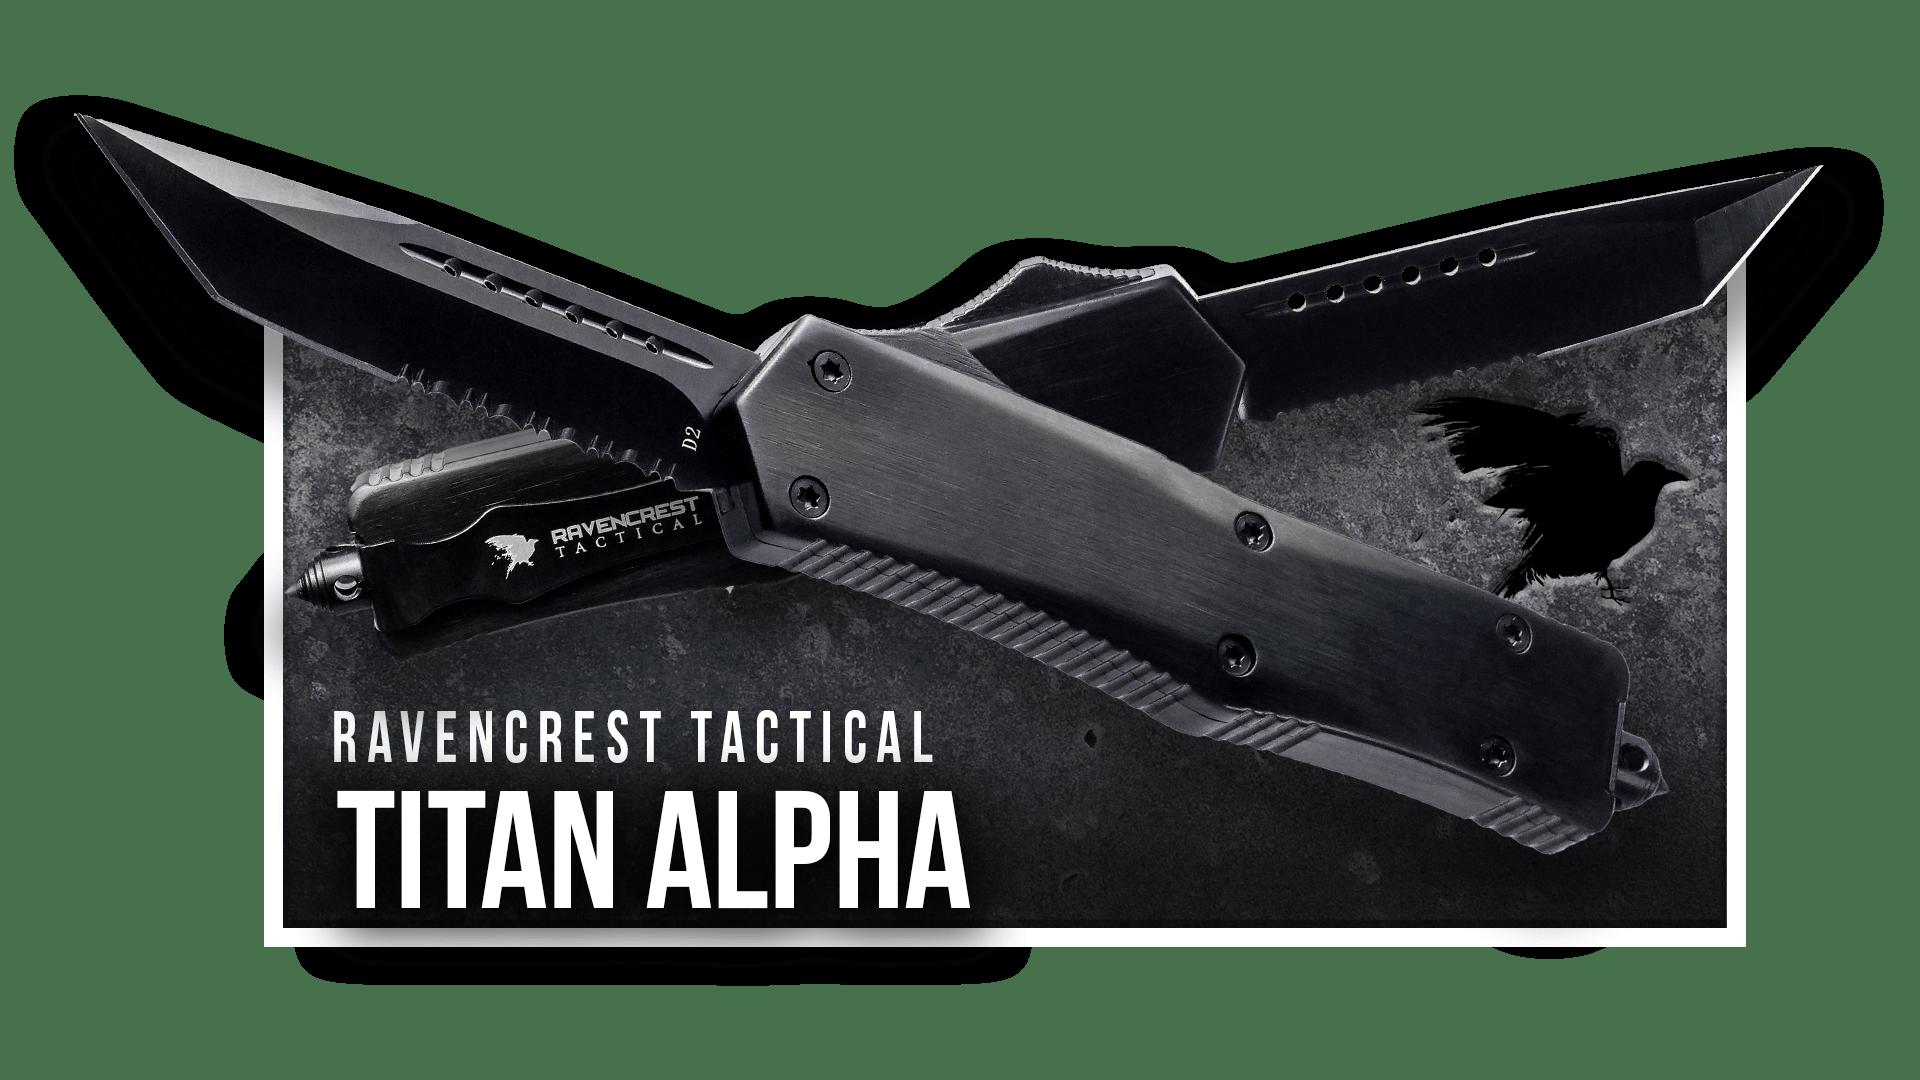 OTF Knife - Titan Alpha - RavenCrest Tactical